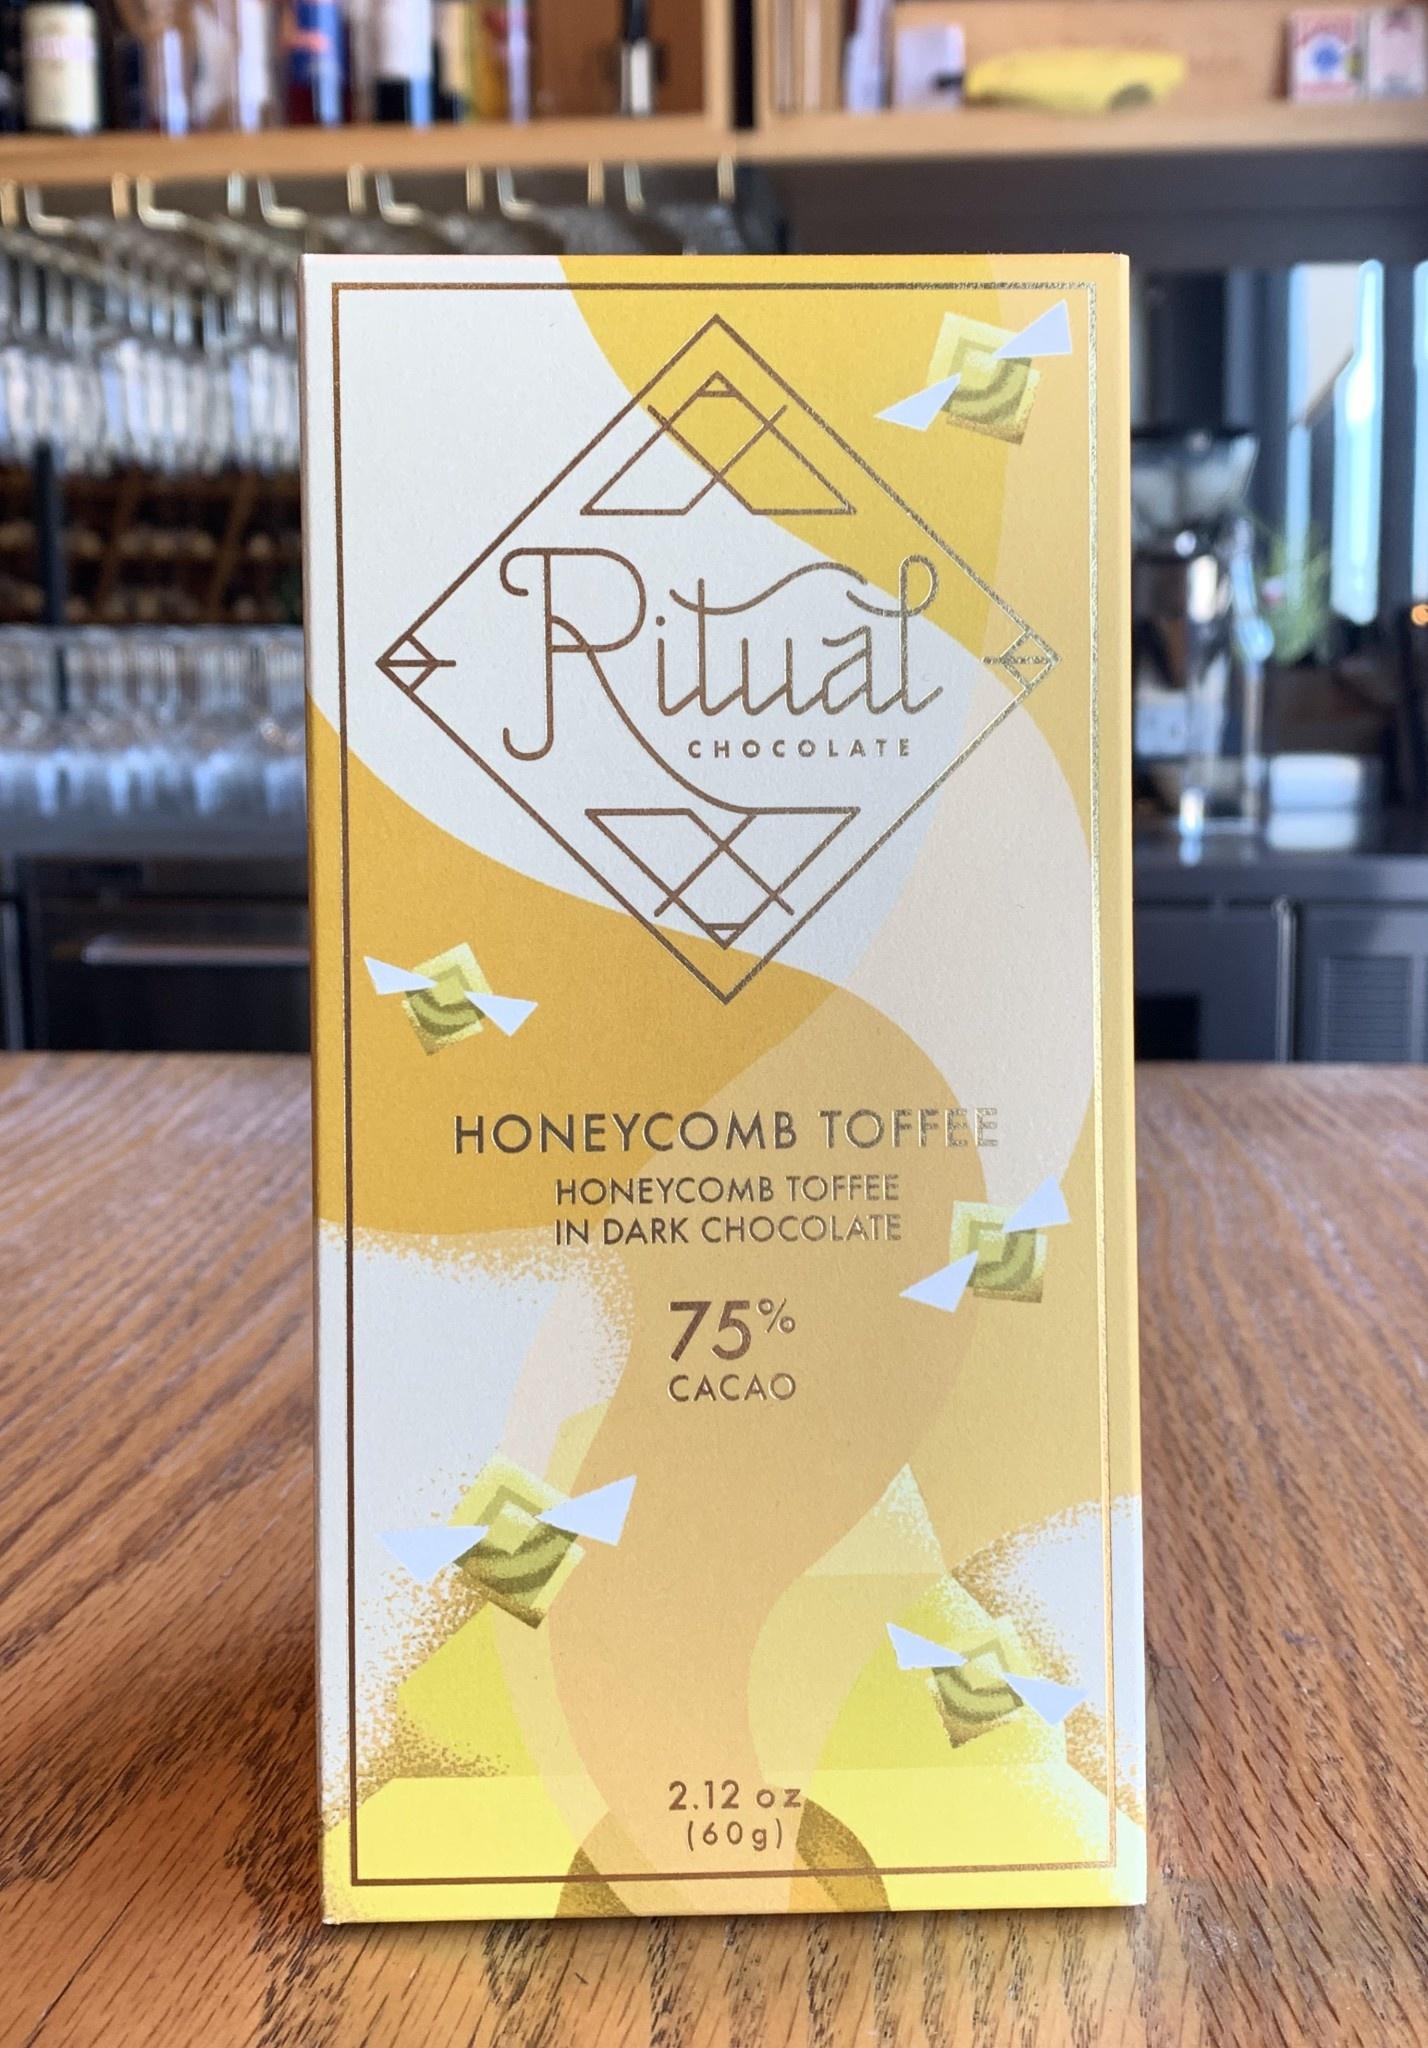 Ritual Chocolate Ritual Chocolate Honeycomb Toffee 75% 60g